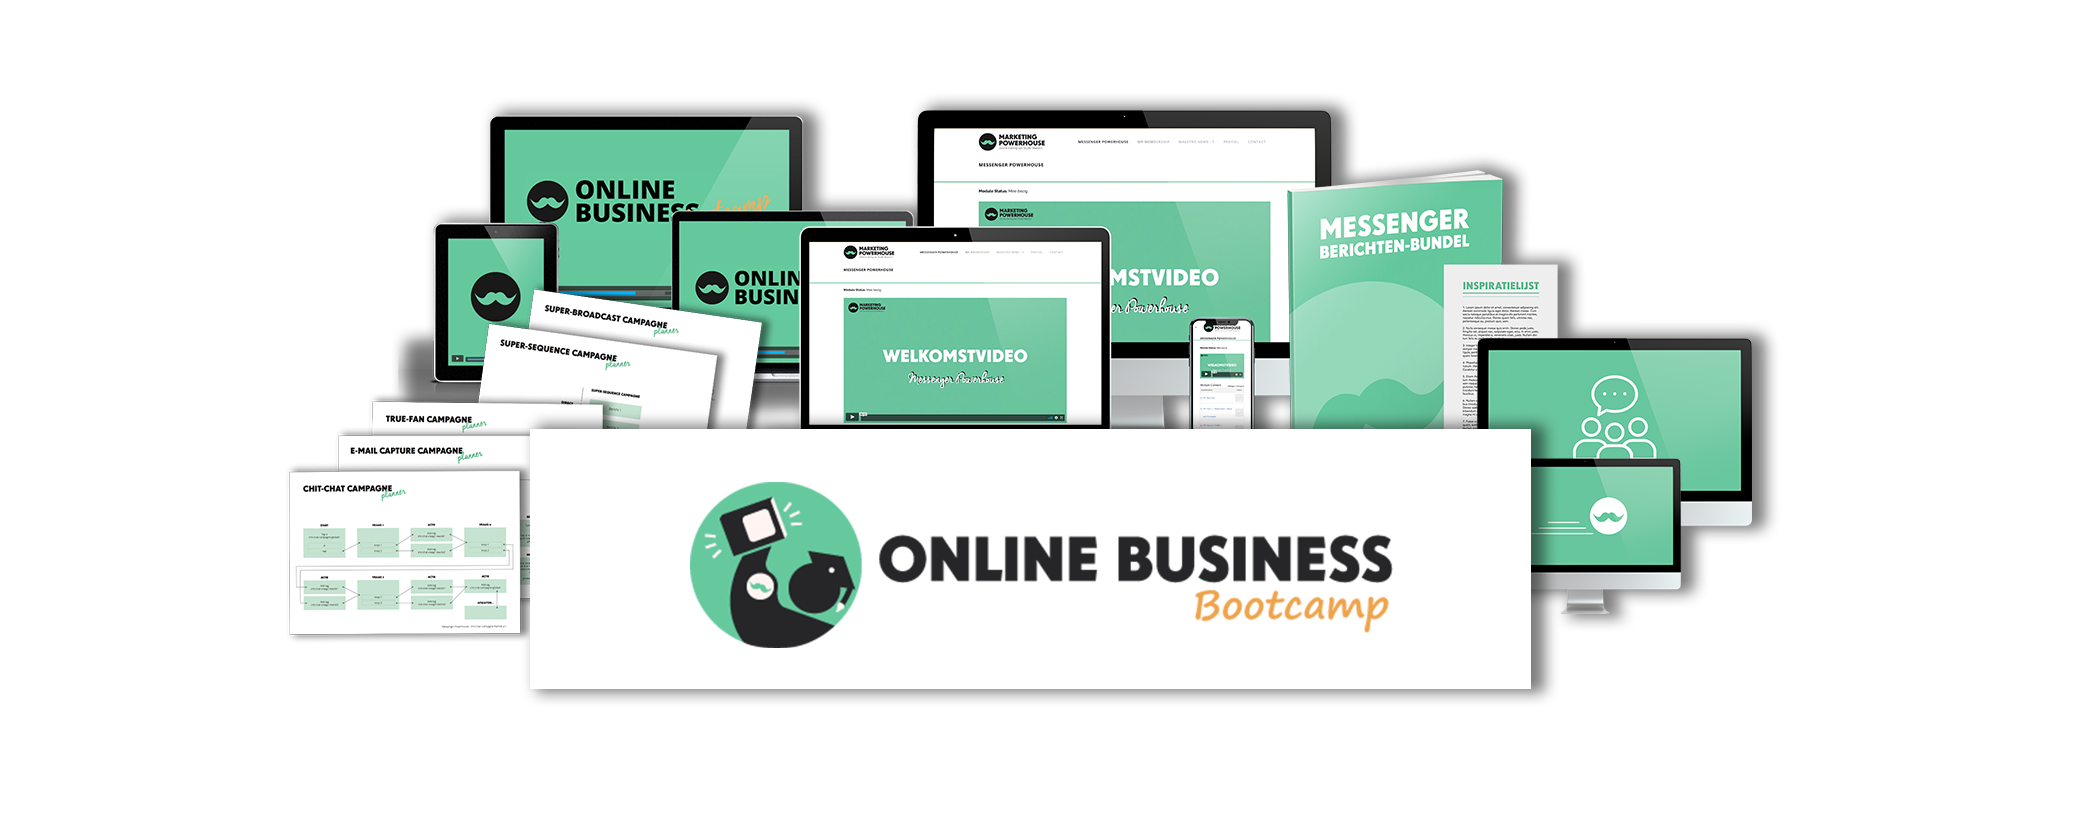 Online Business Bootcamp